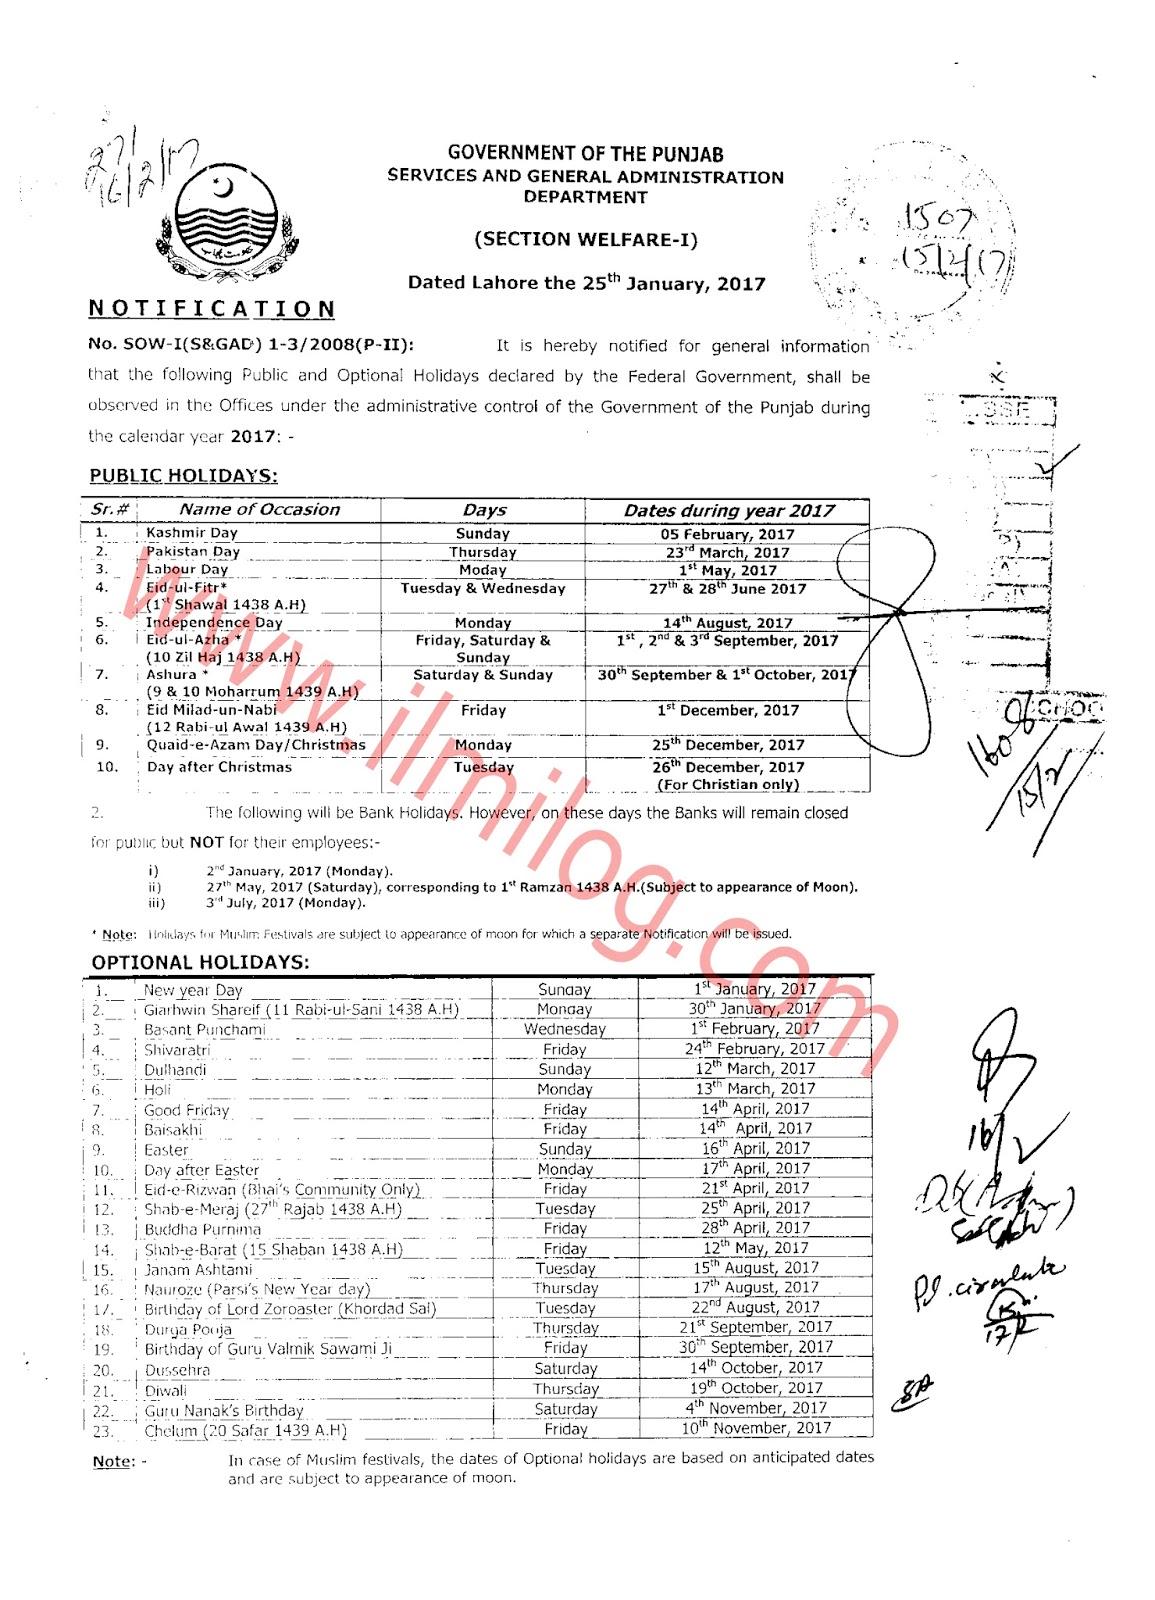 Punjab Government Eid Holidays Notification 2017